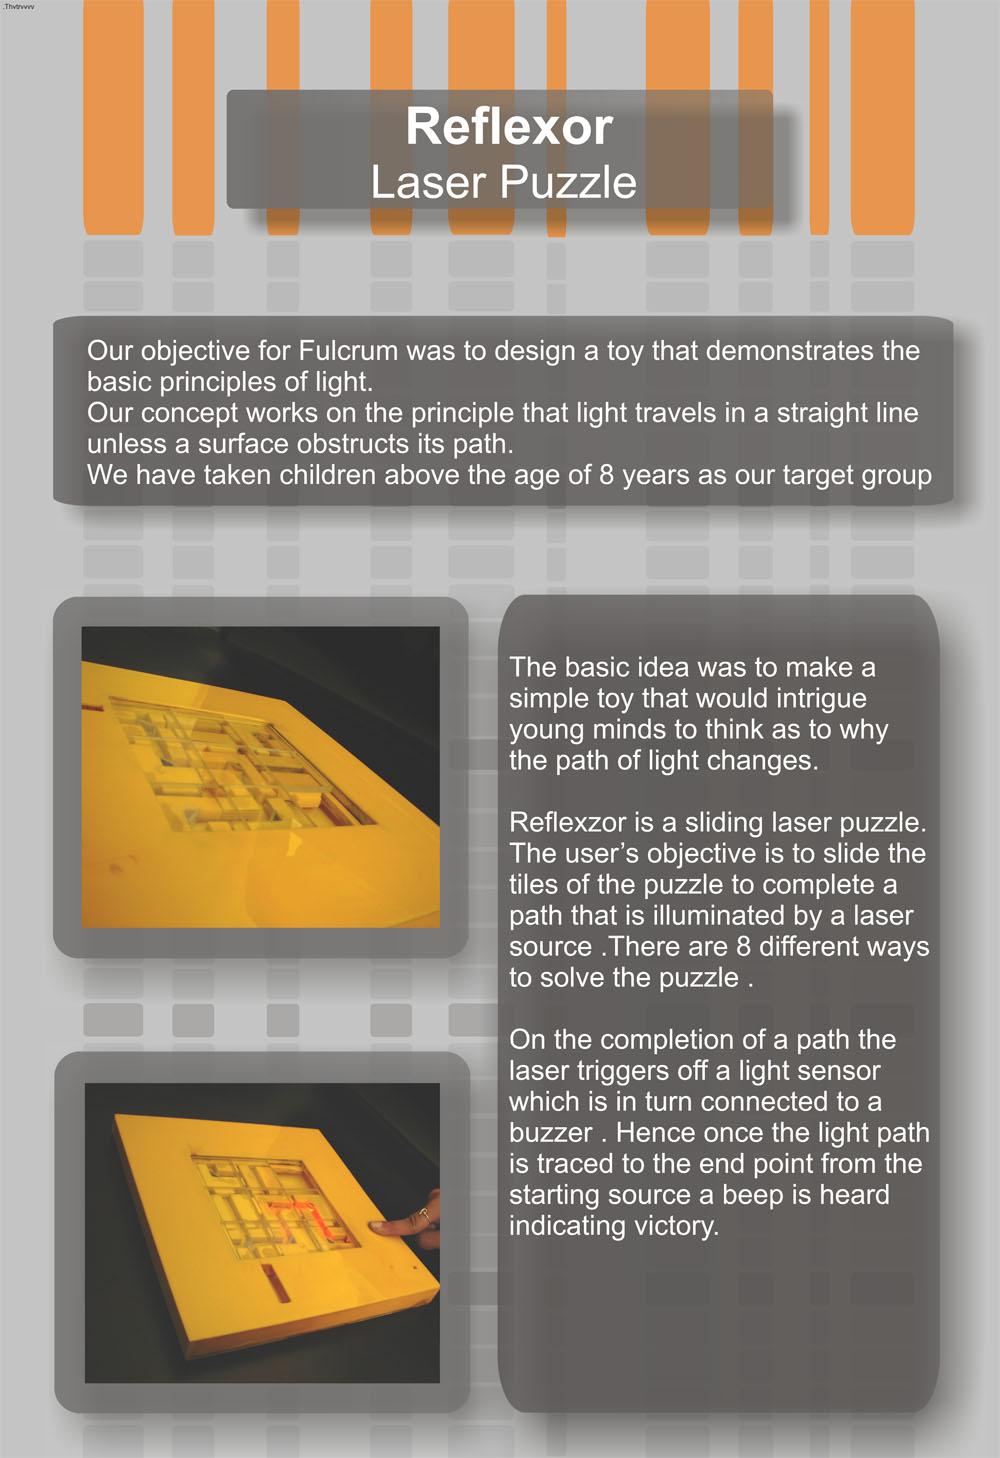 bhagwat puran in sanskrit with hindi translation pdf